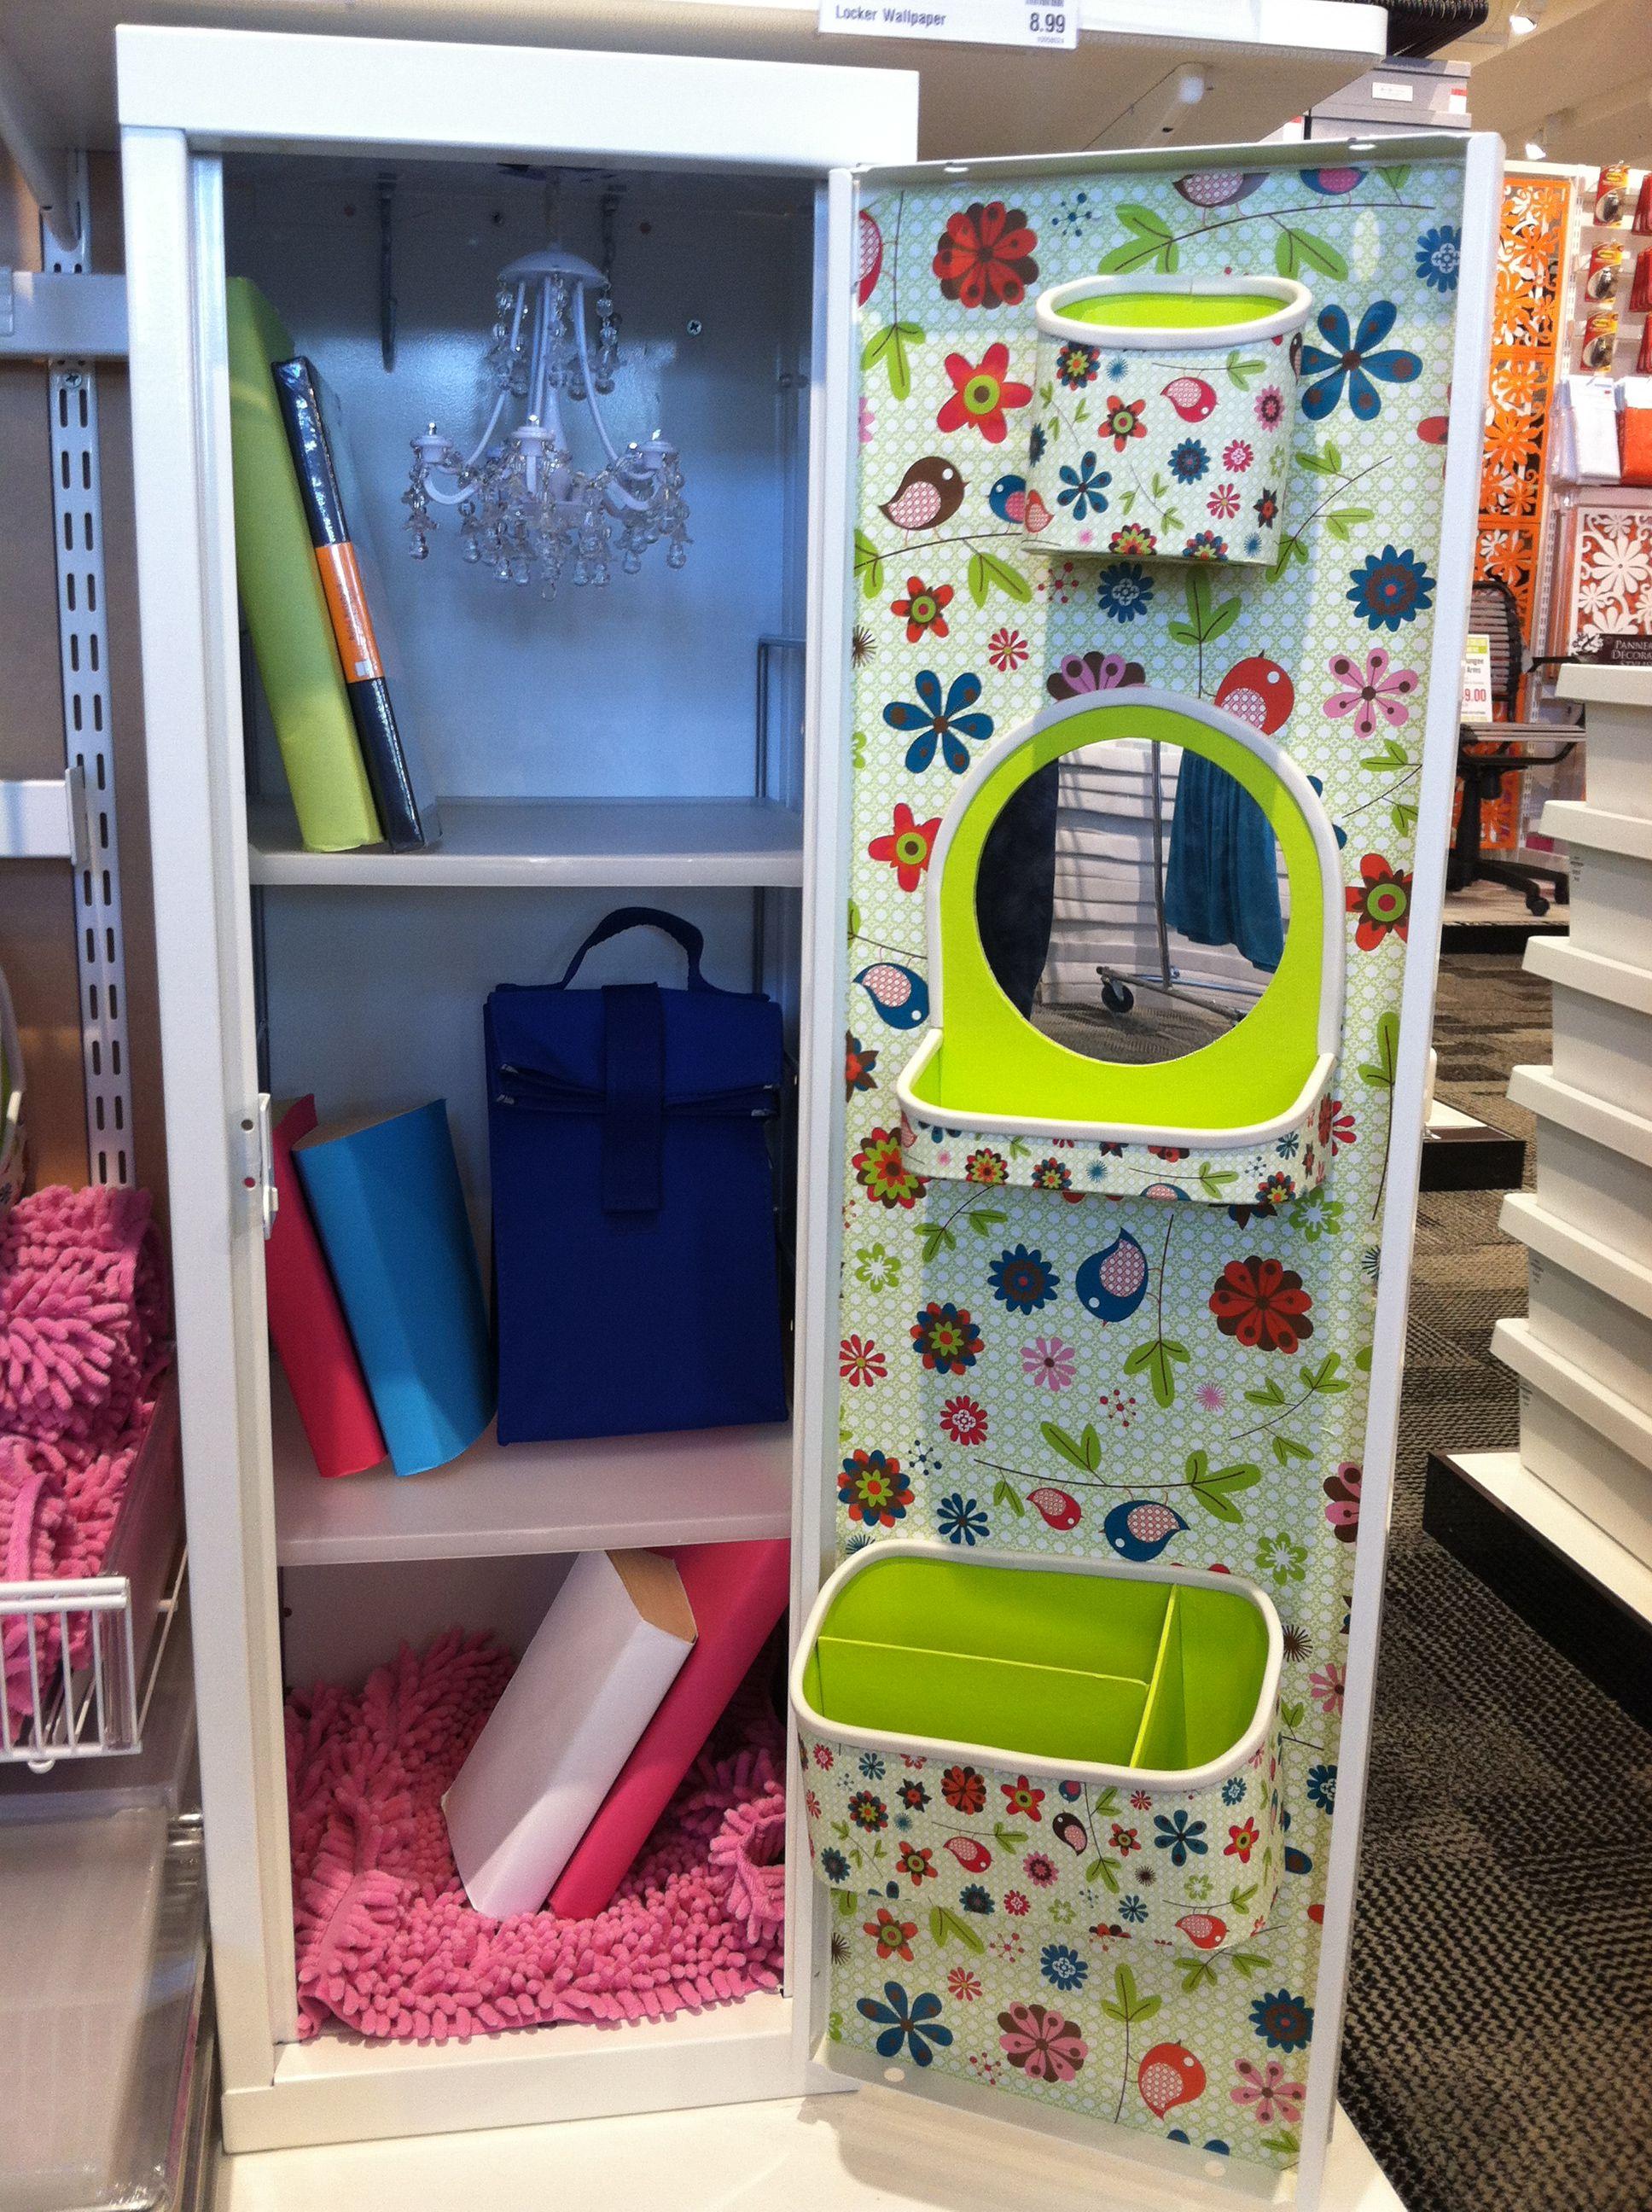 locker decorating ideas - photo #38